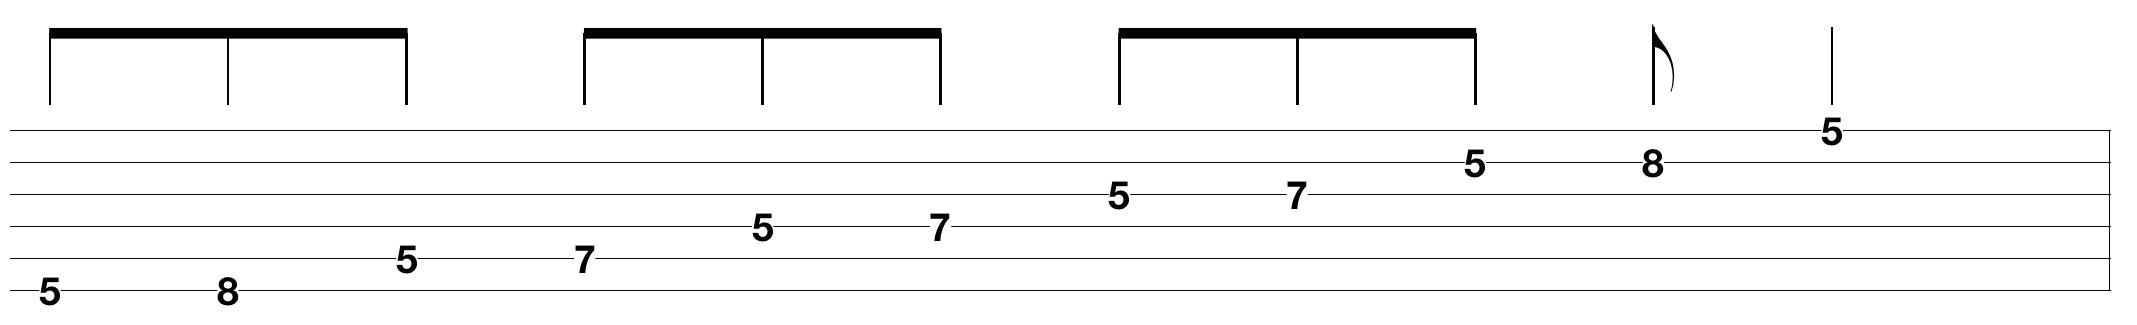 blues-guitar-tips_2.png